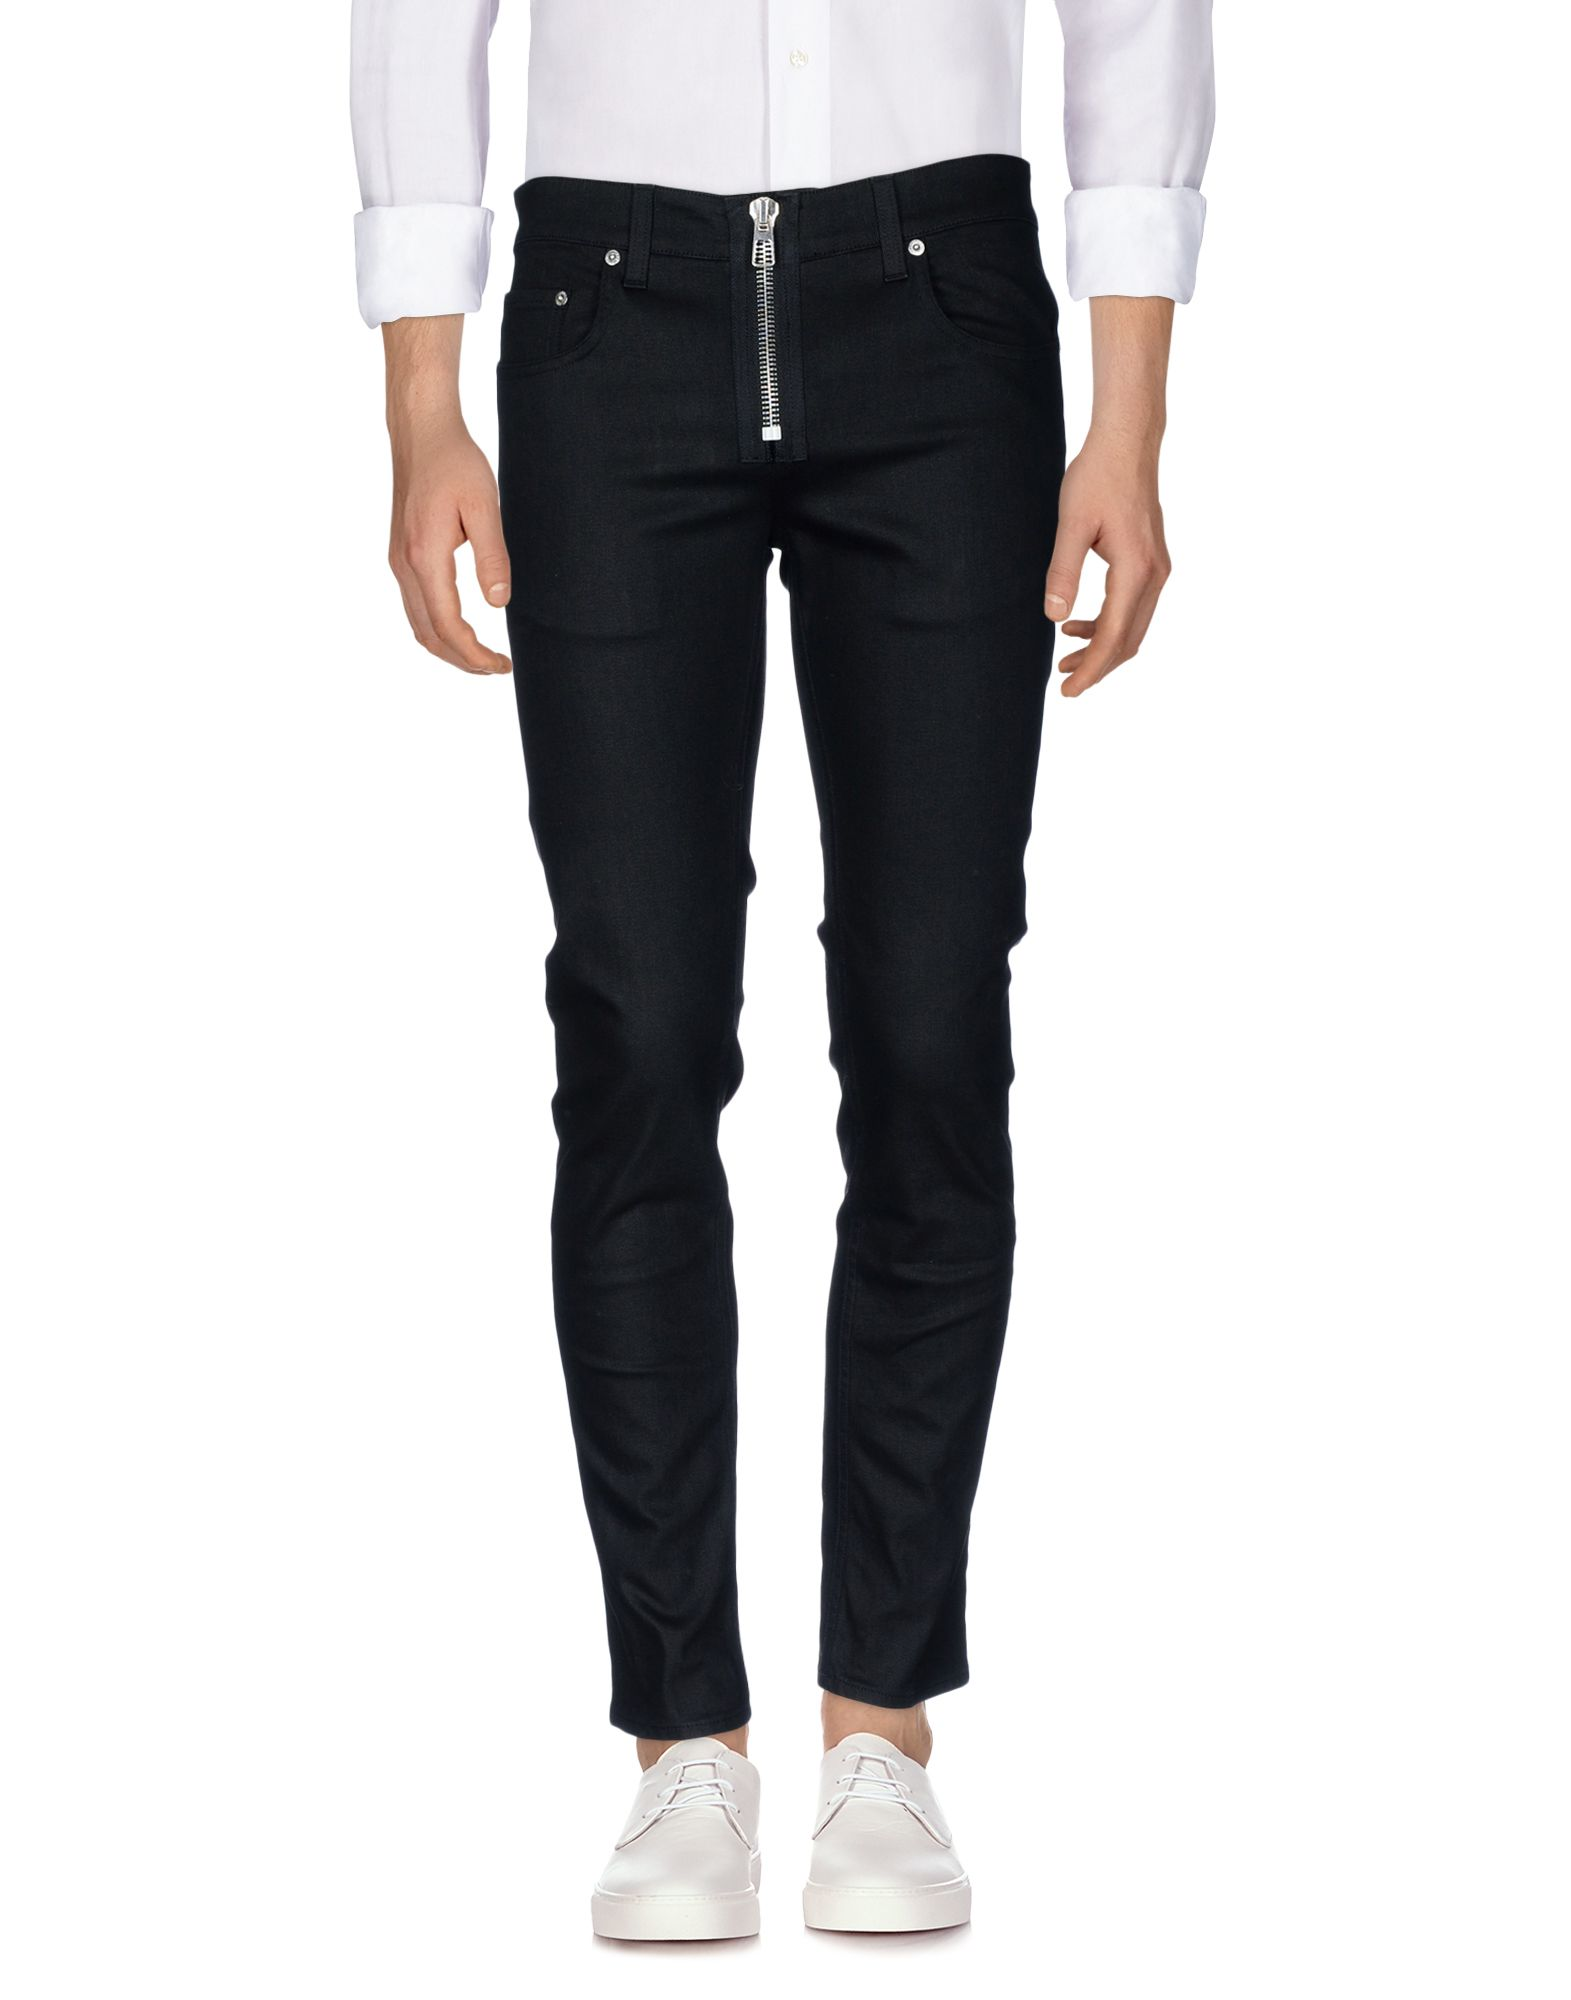 Pantaloni Jeans Department Uomo 5 Uomo Department - 42647990CJ 3fce55